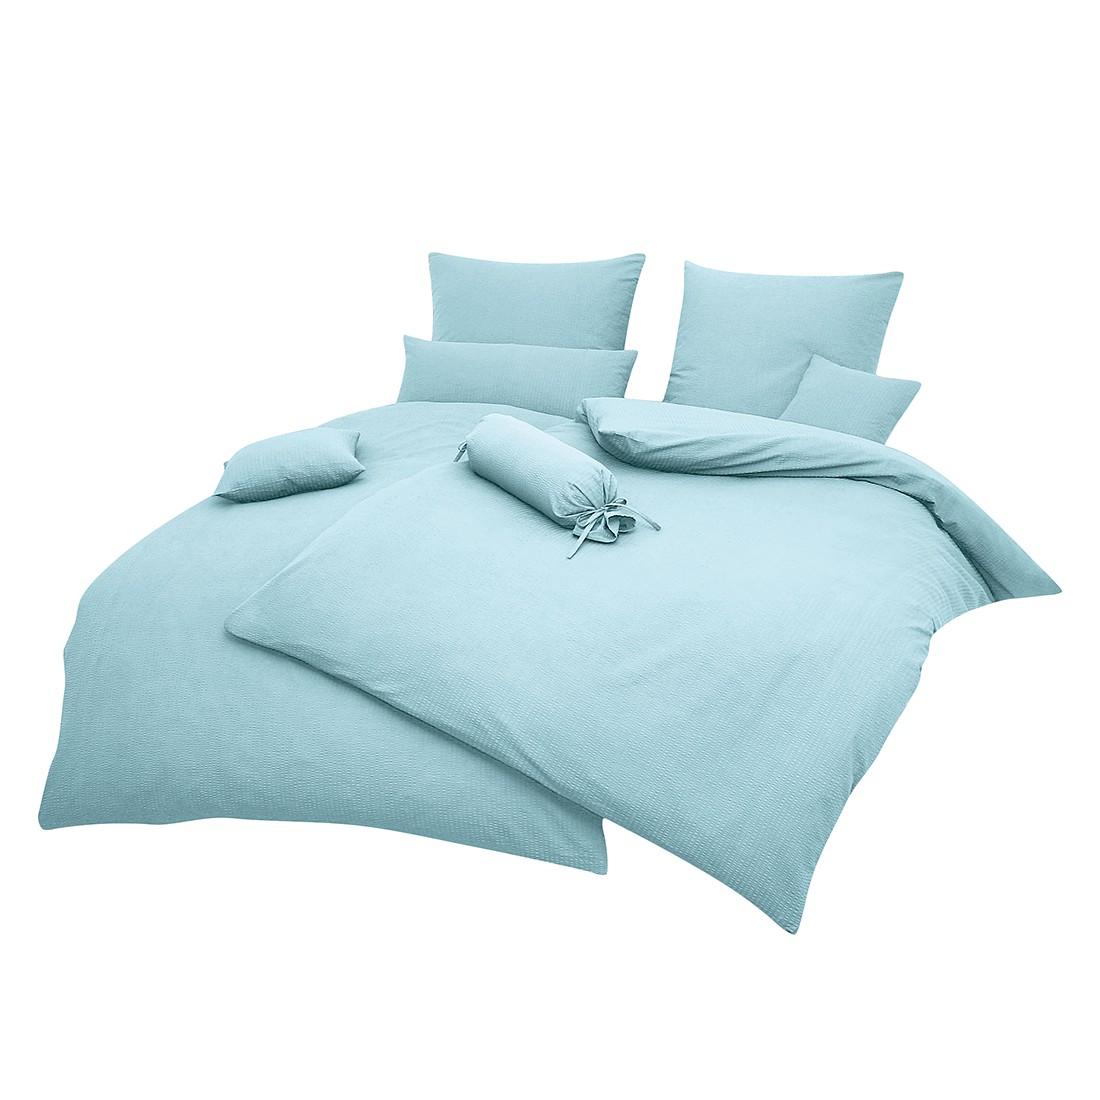 Home 24 - Taie d oreiller piano uni - bleu brillant - 80 x 80 cm, janine